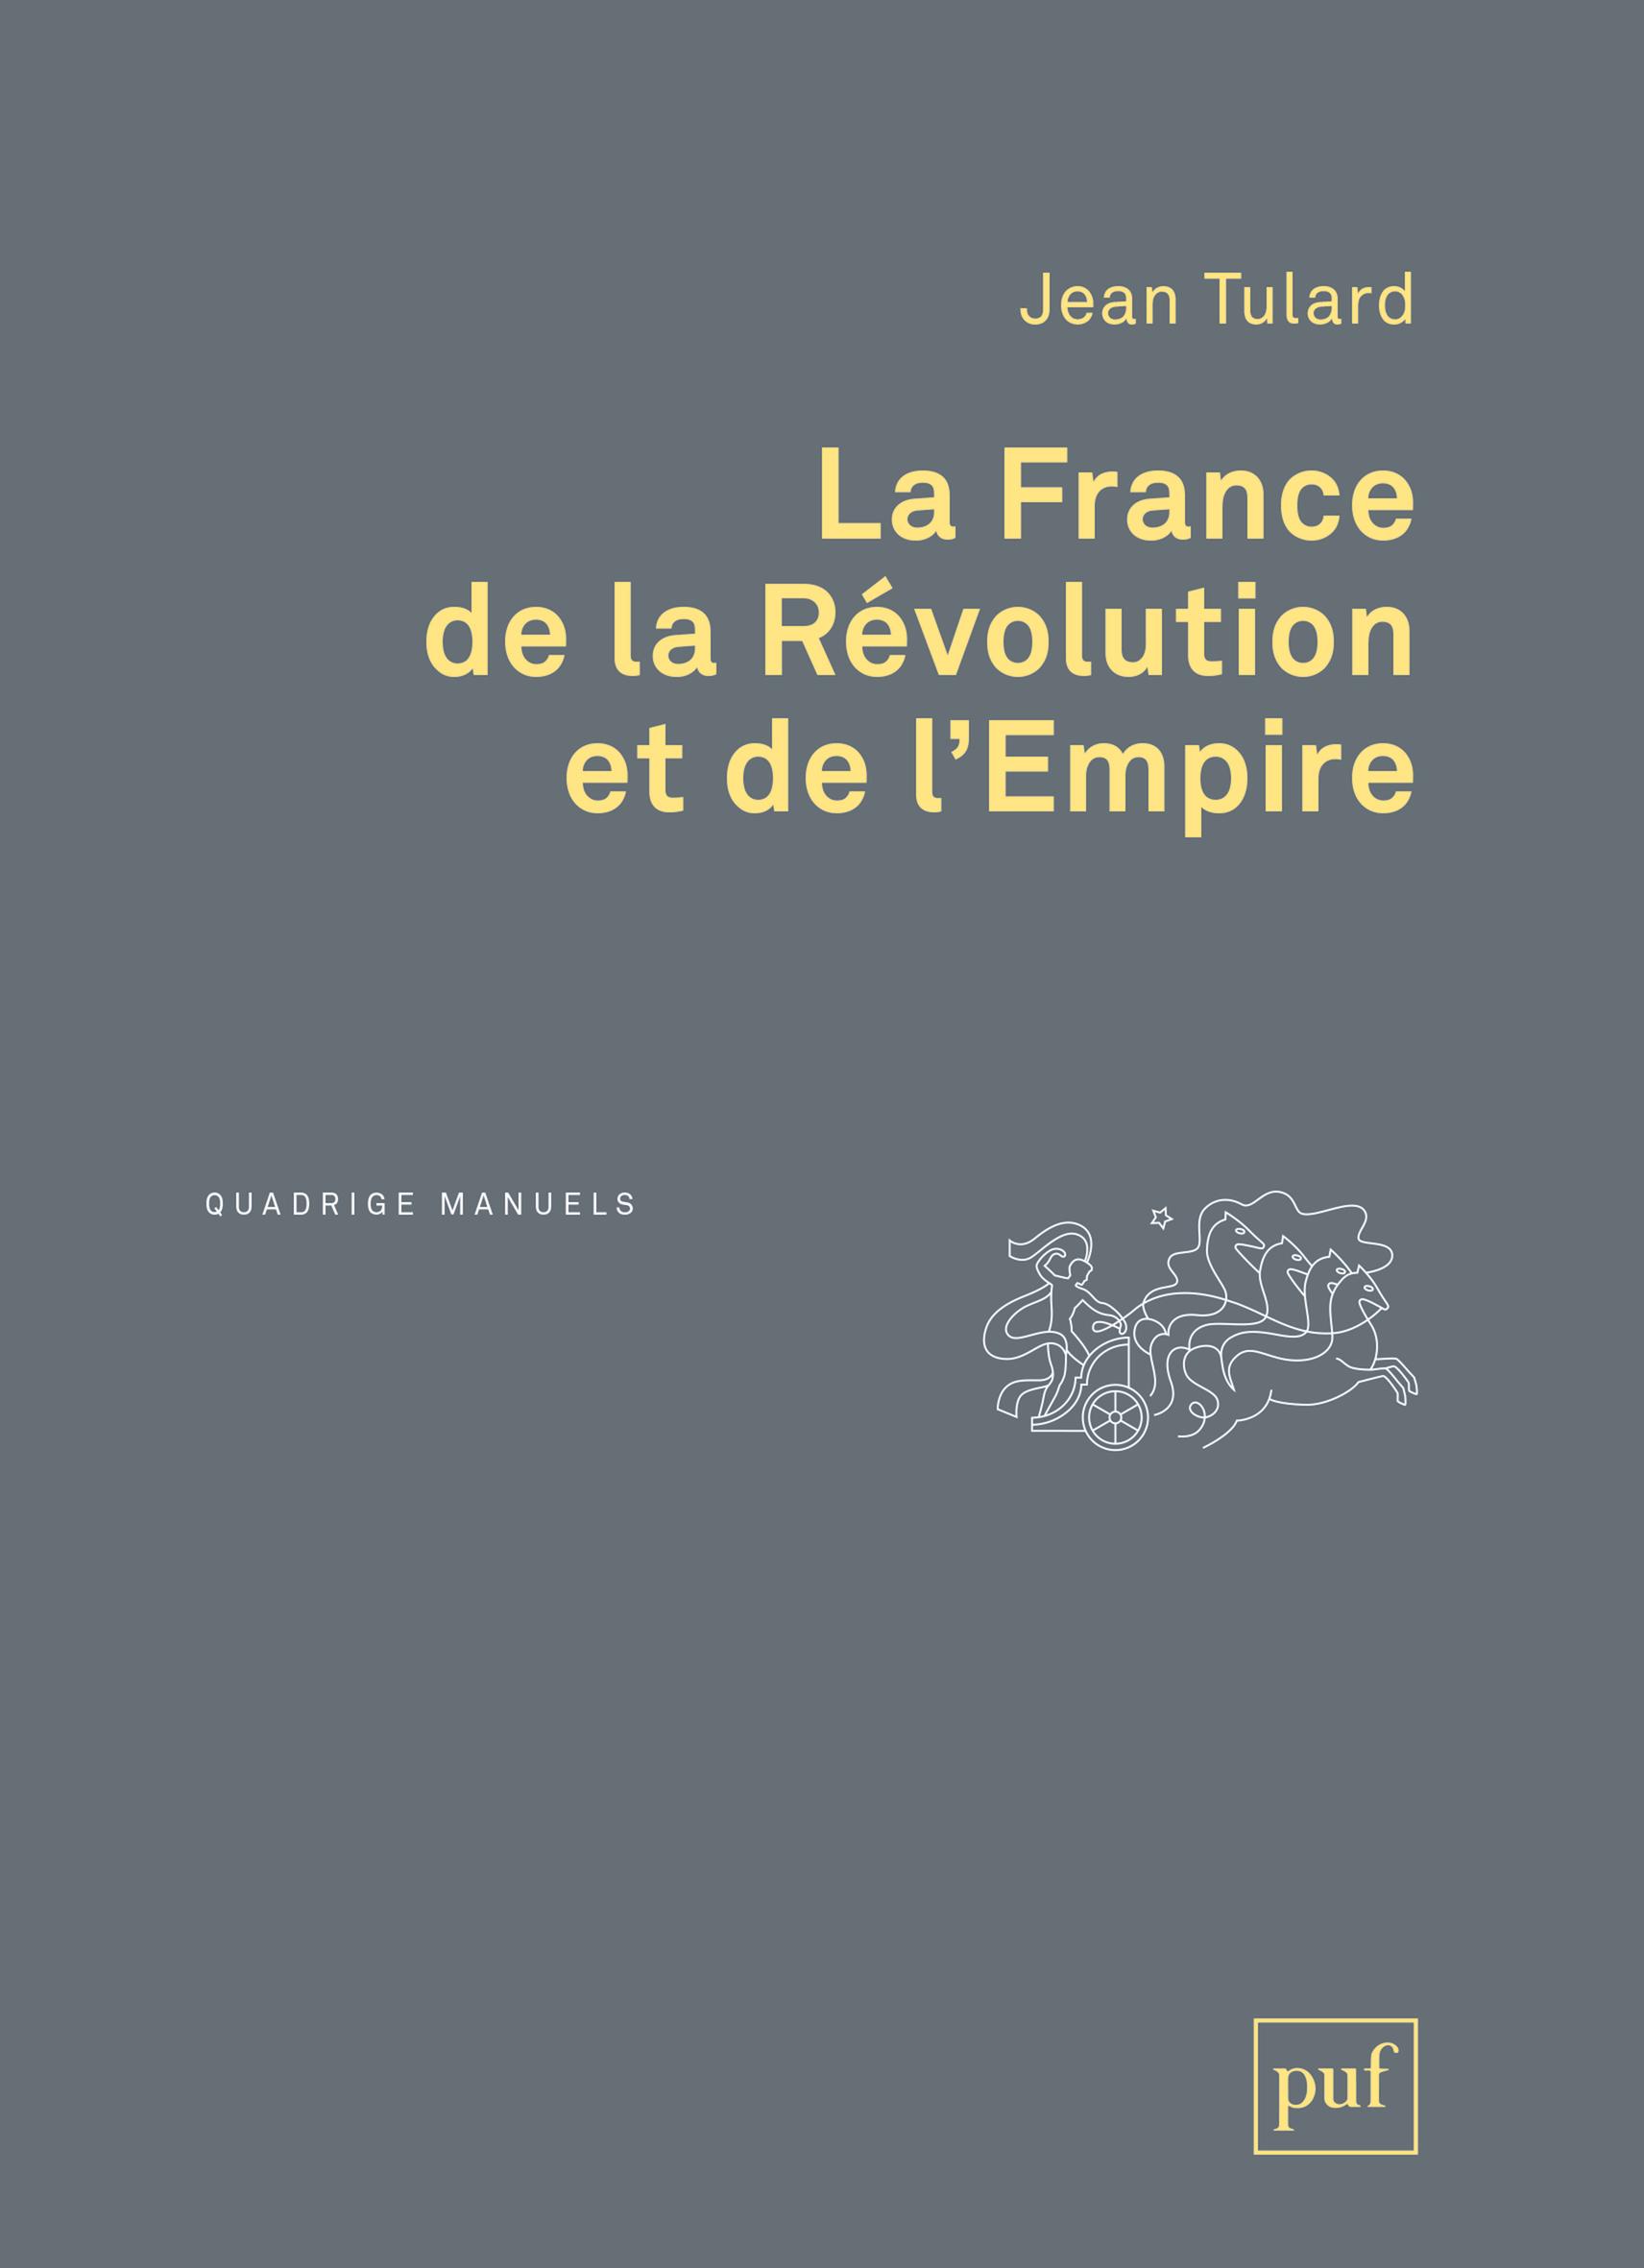 LA FRANCE DE LA REVOLUTION ET DE L'EMPIRE (2ED)